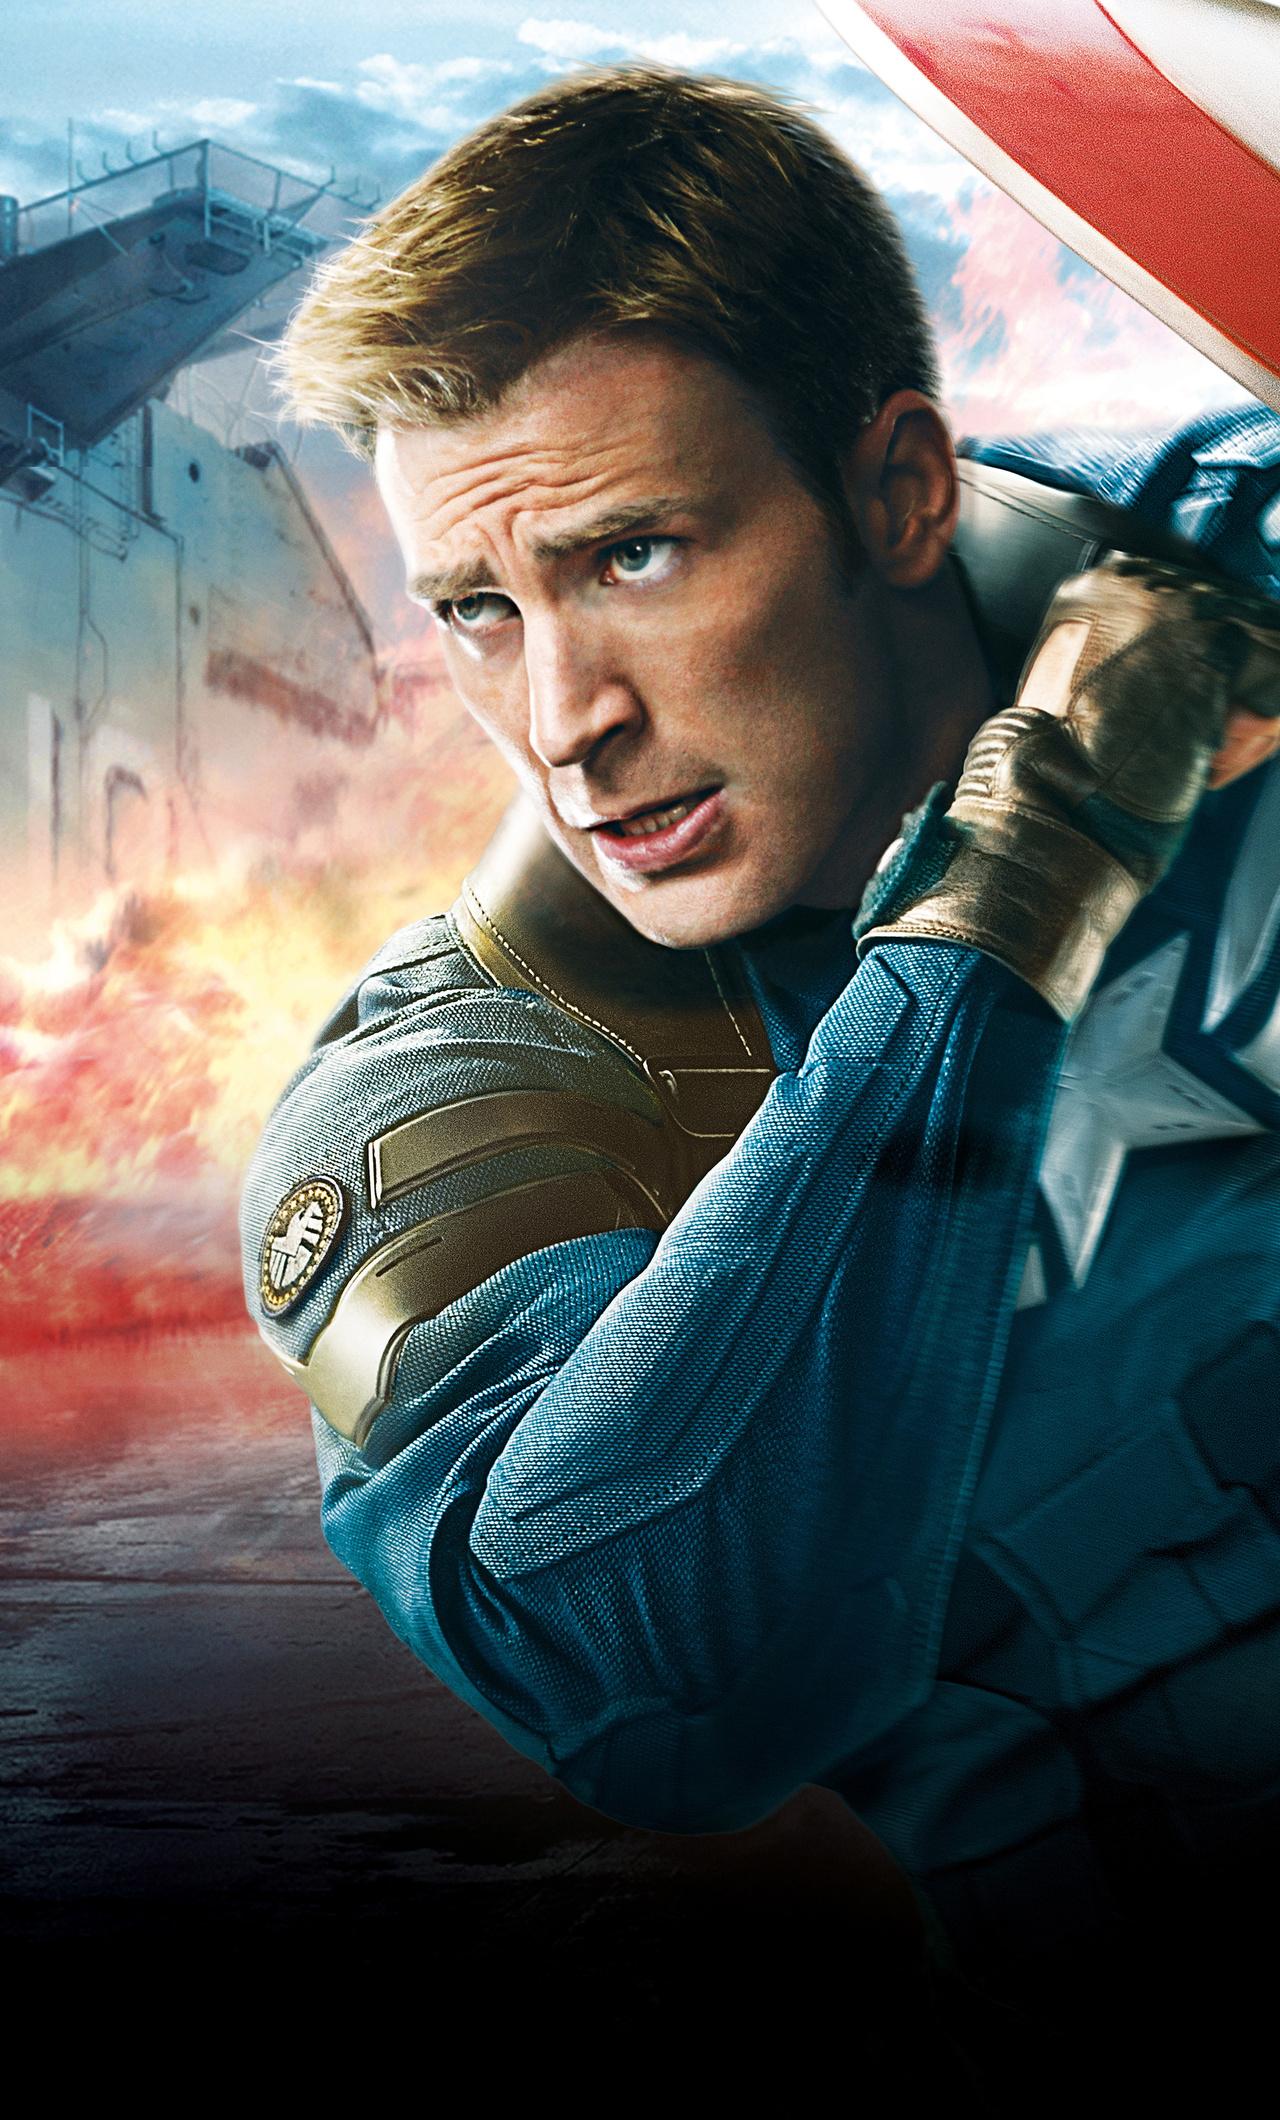 1280x2120 Chris Evans Captain America Army 8k iPhone 6+ HD ...